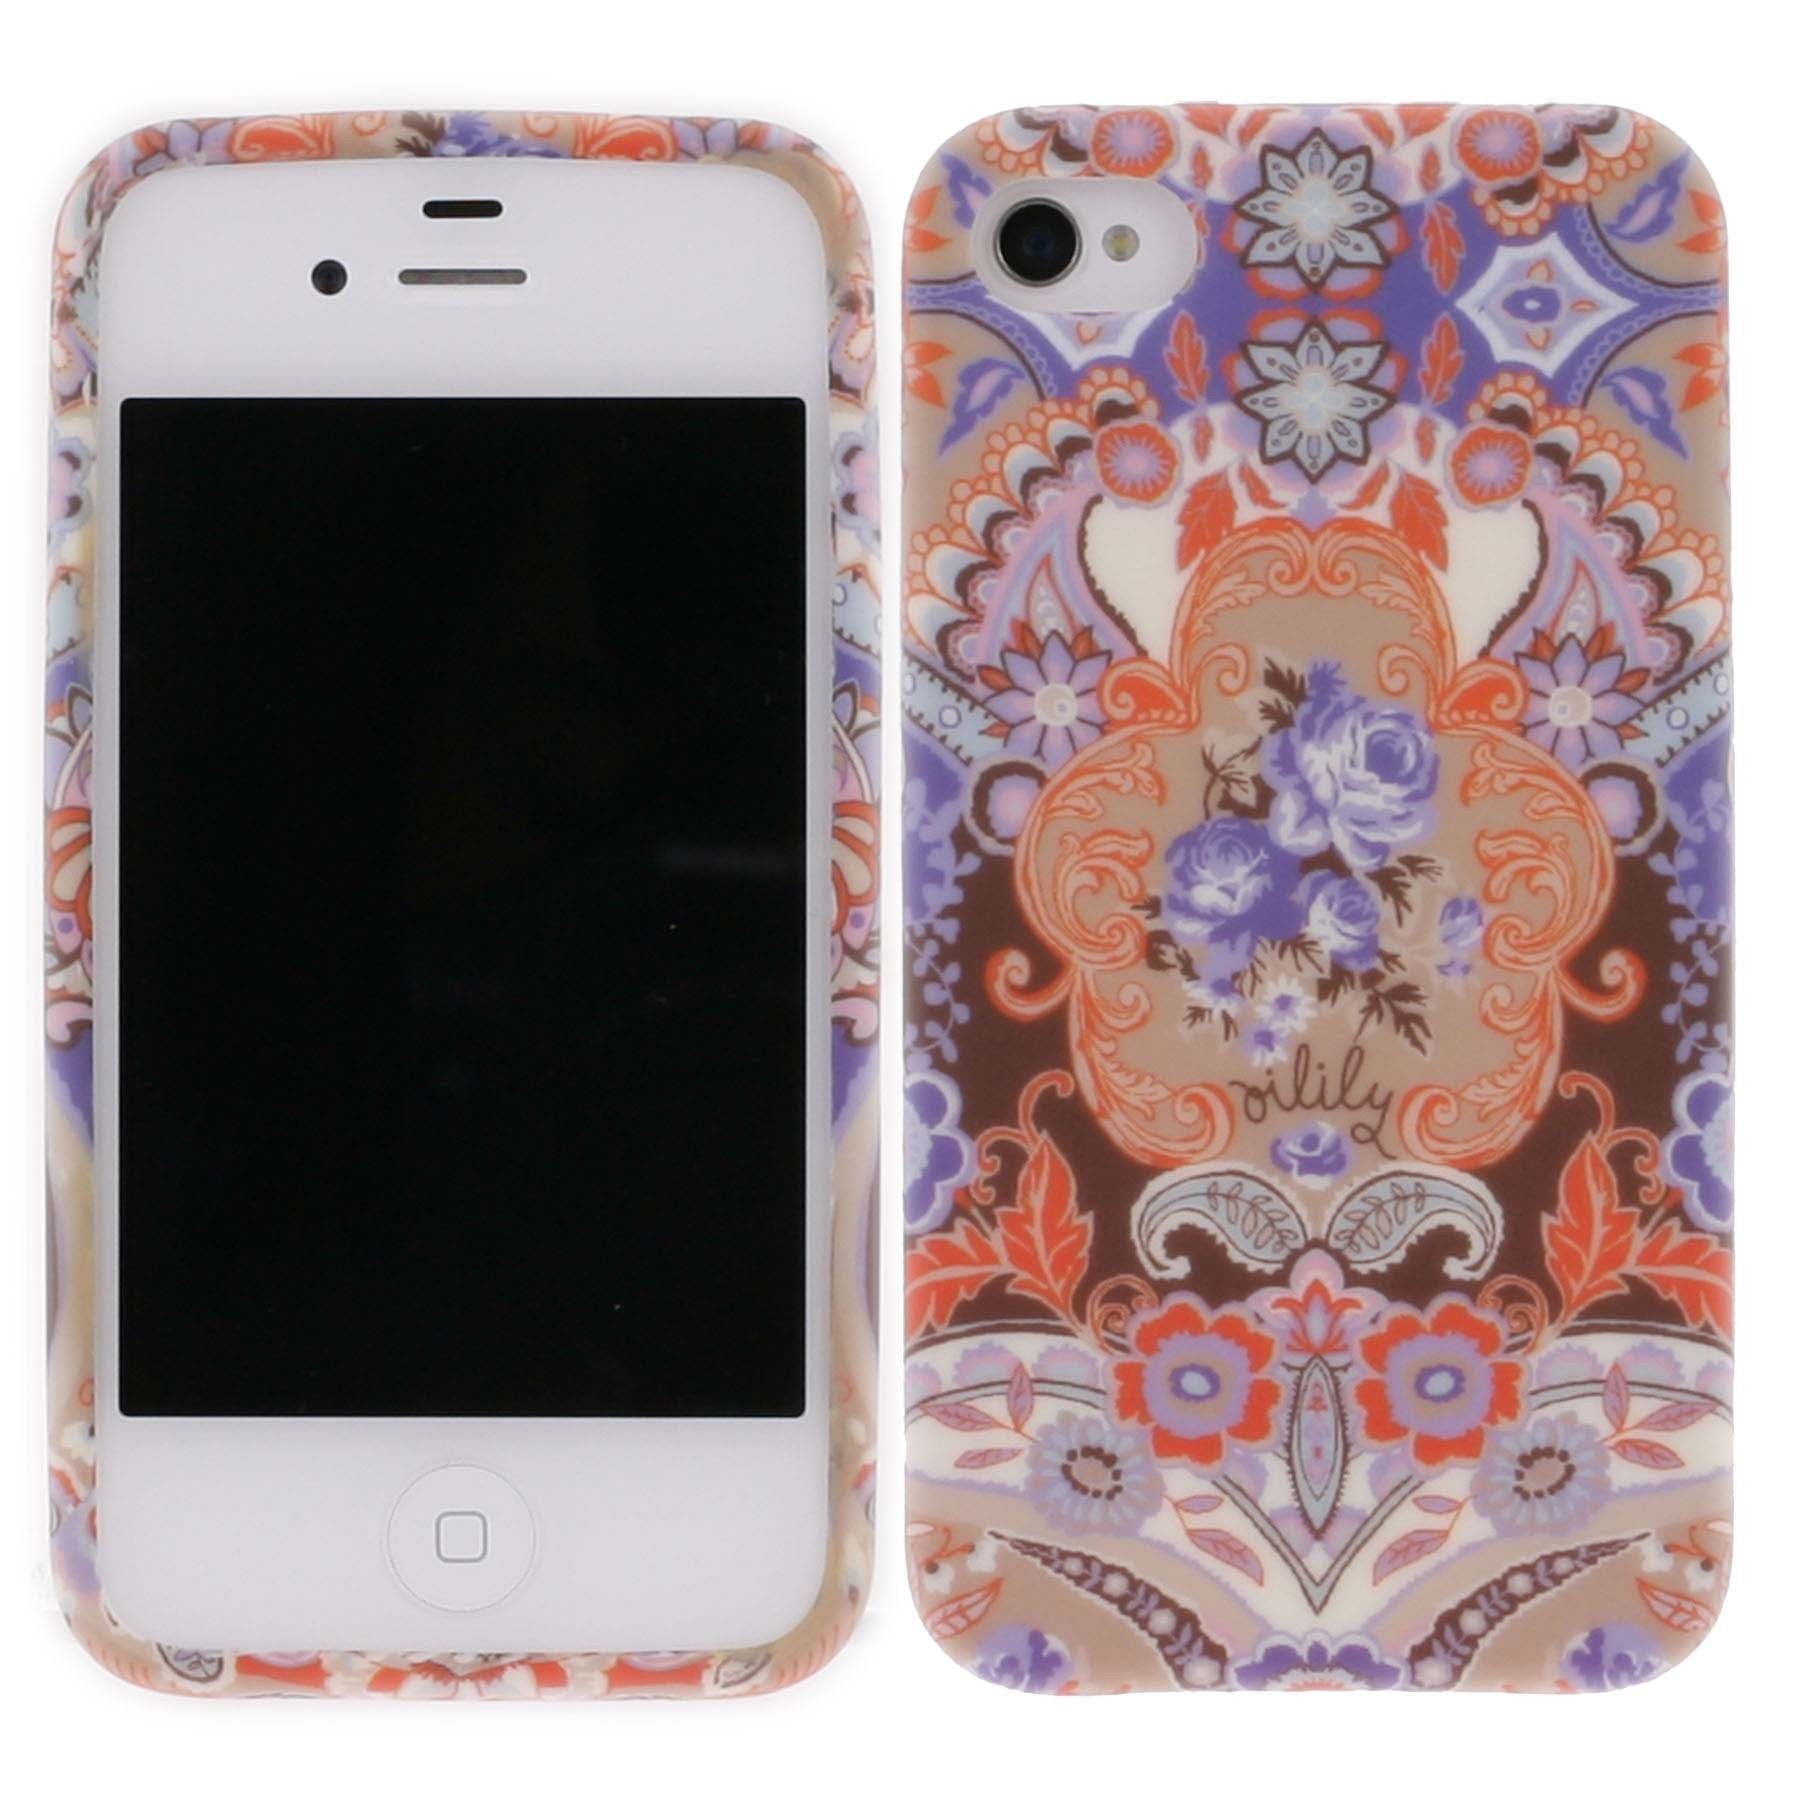 oilily iphone 4 4s h lle case hardcase summer mosaic fig. Black Bedroom Furniture Sets. Home Design Ideas